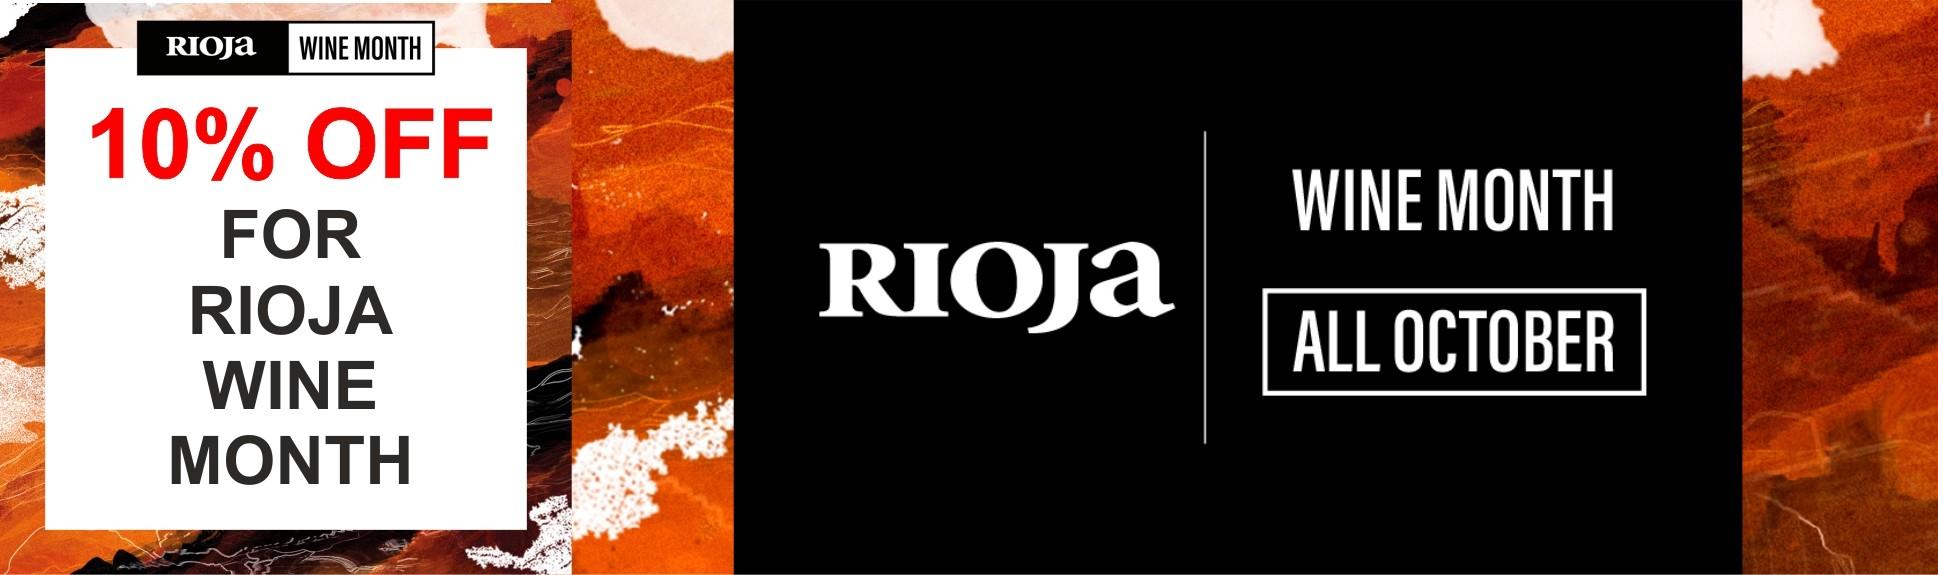 Rioja Wine Month